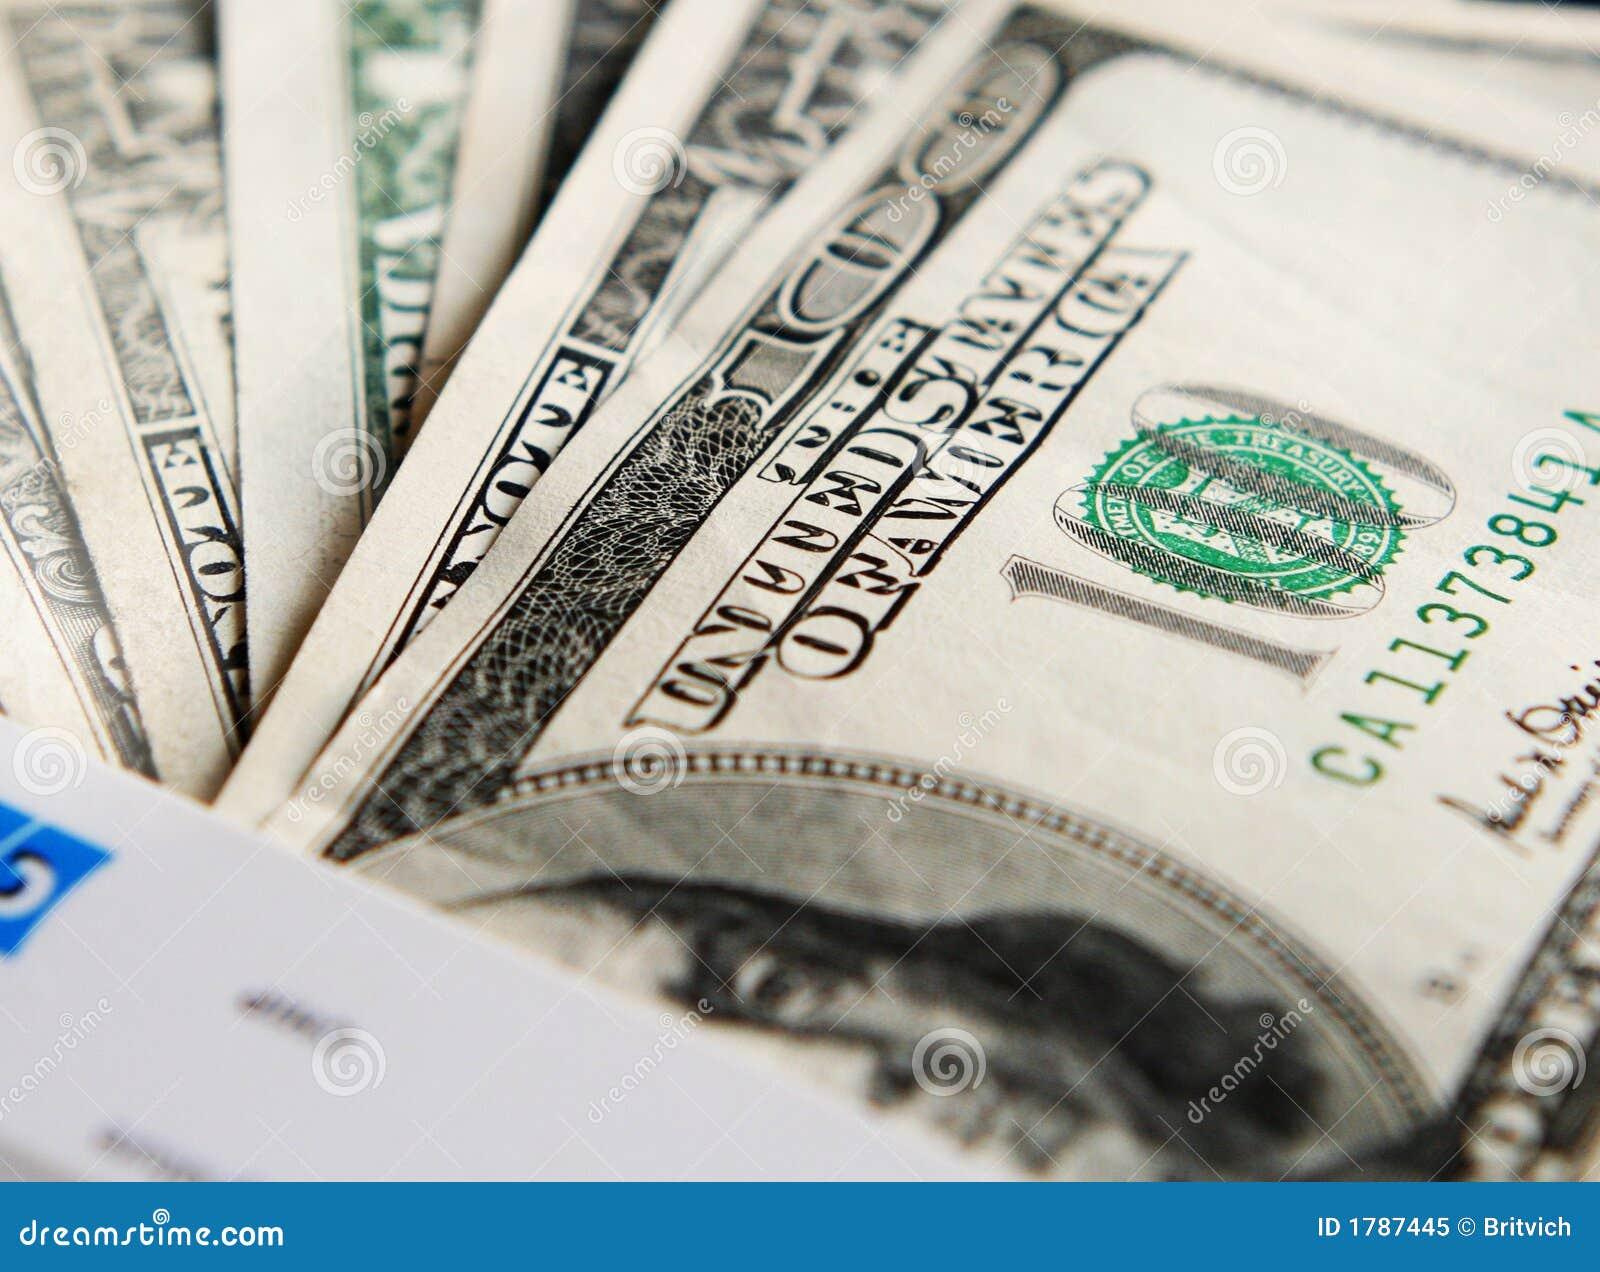 USA cash Banknotes